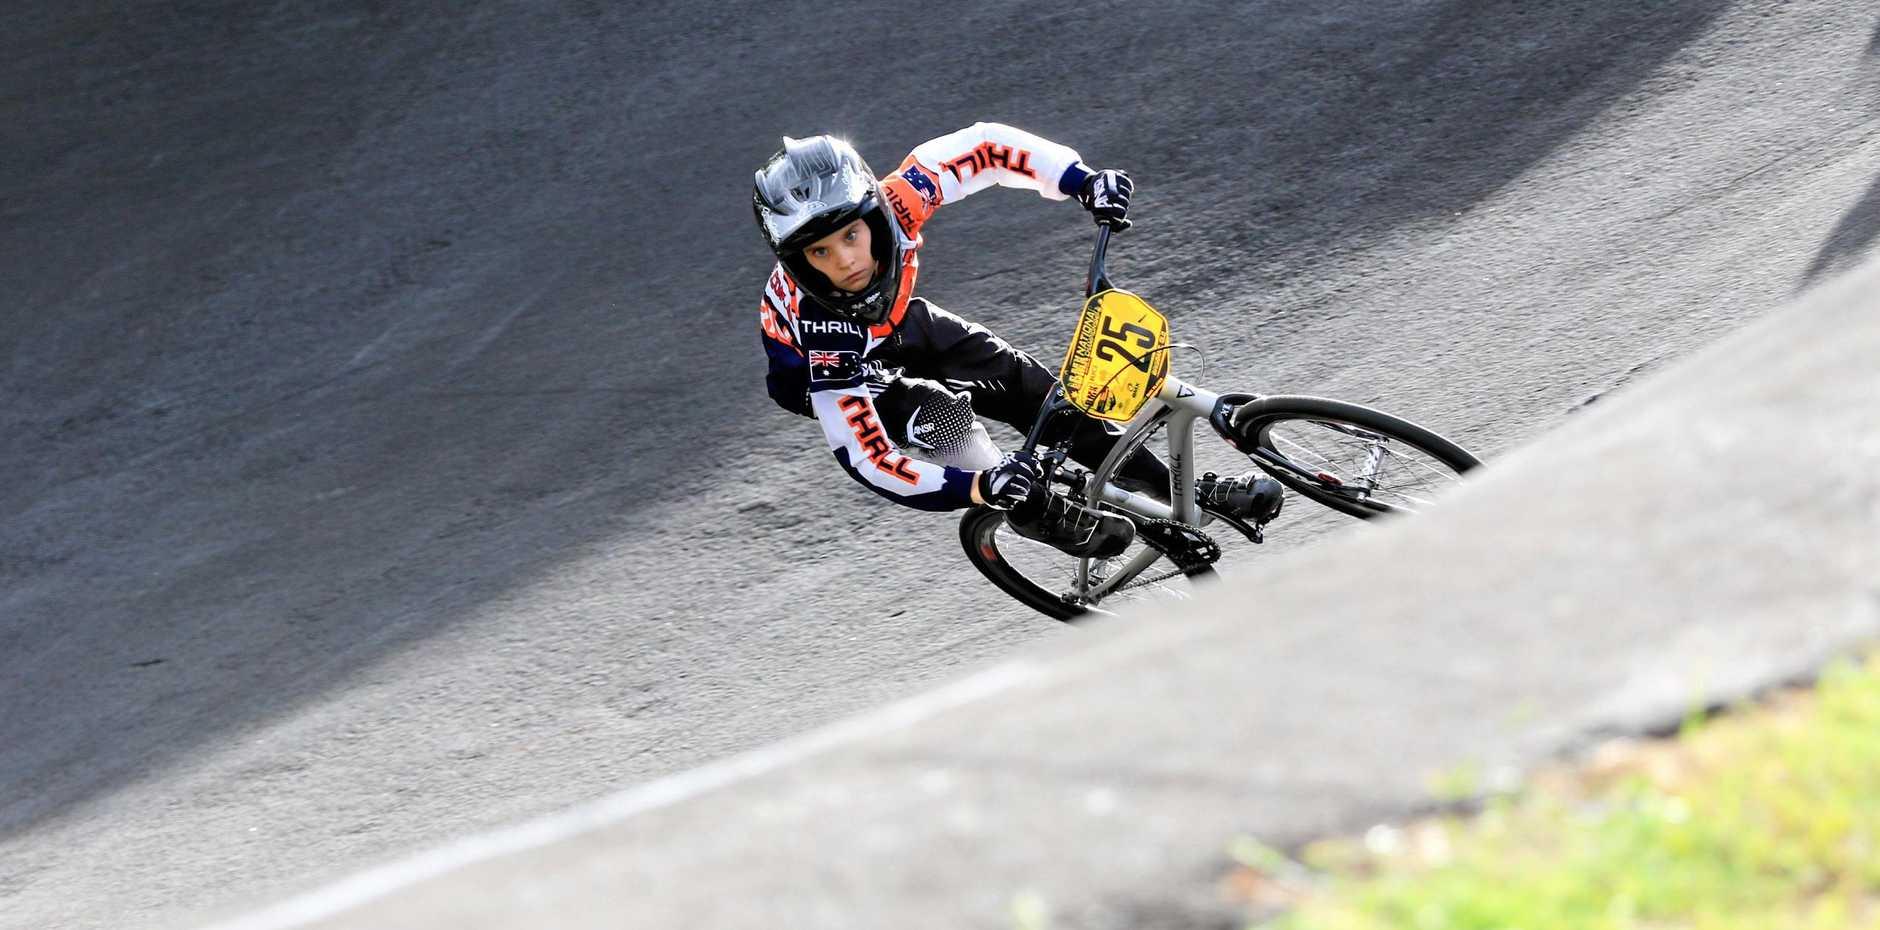 Moranbah BMX Club rider Oliver Rivers